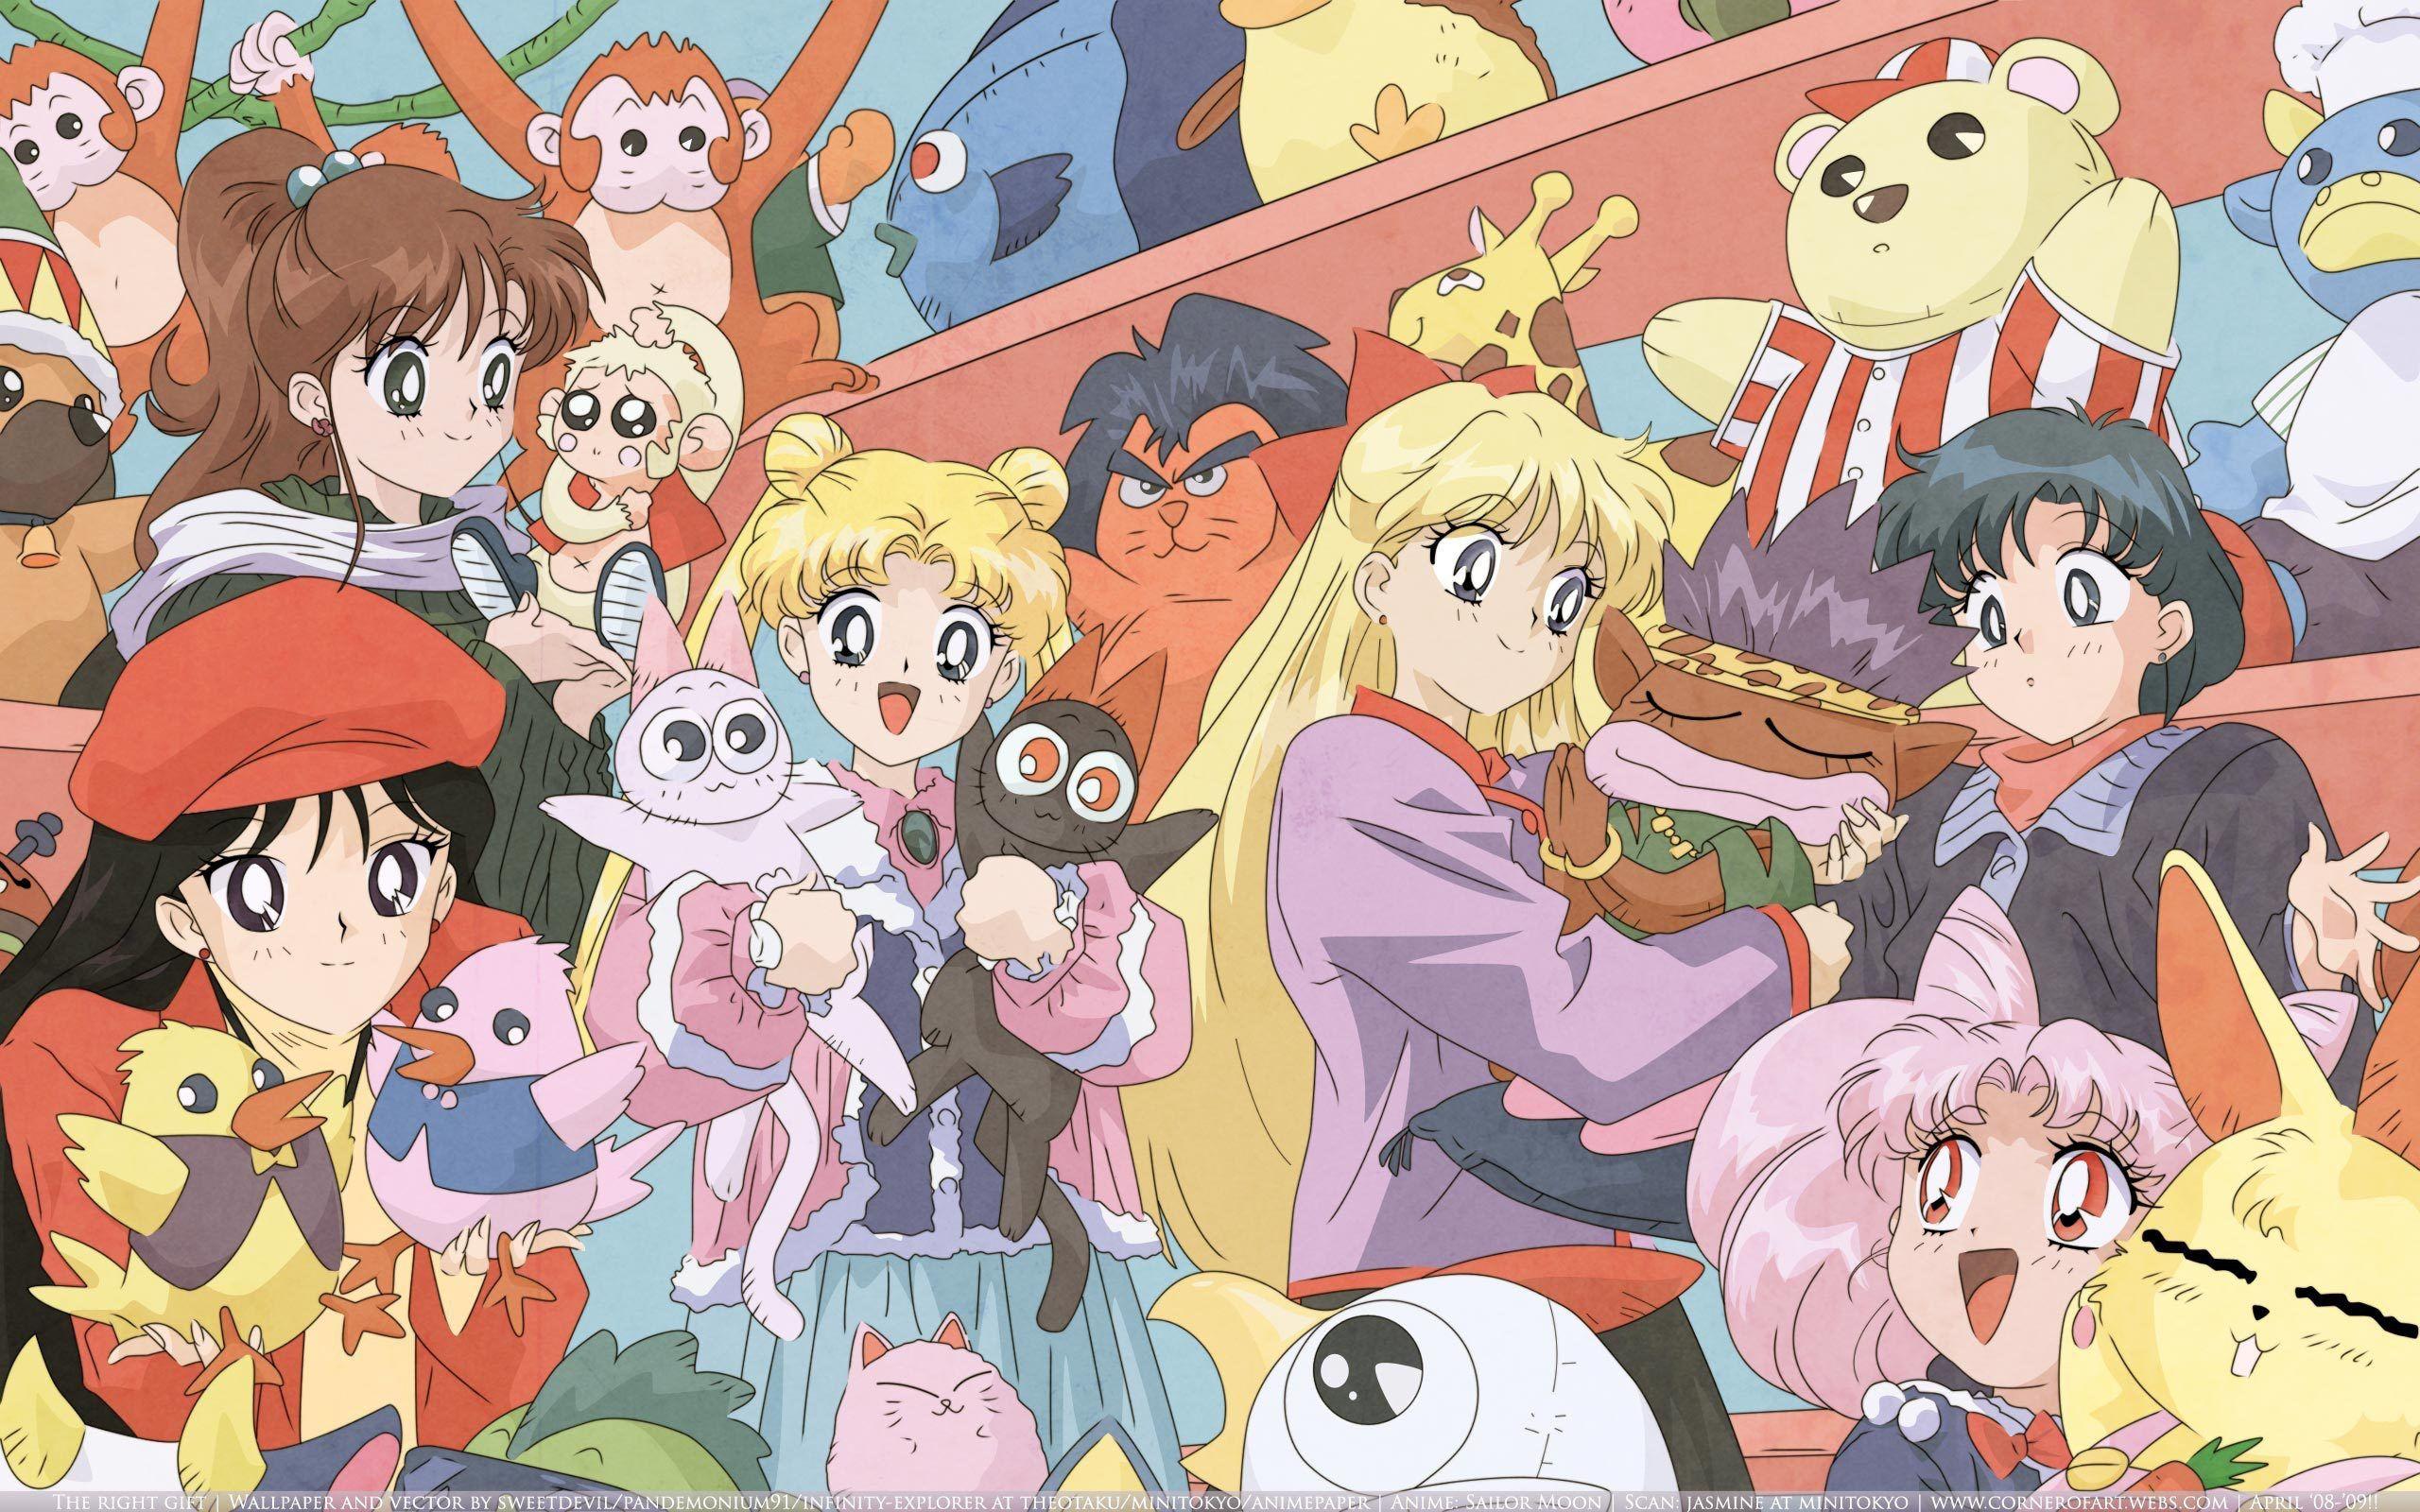 2560x1600 Quality Cool Sailor Moon Sailor Moon Wallpaper Sailor Moon Super S Sailor Moon Character